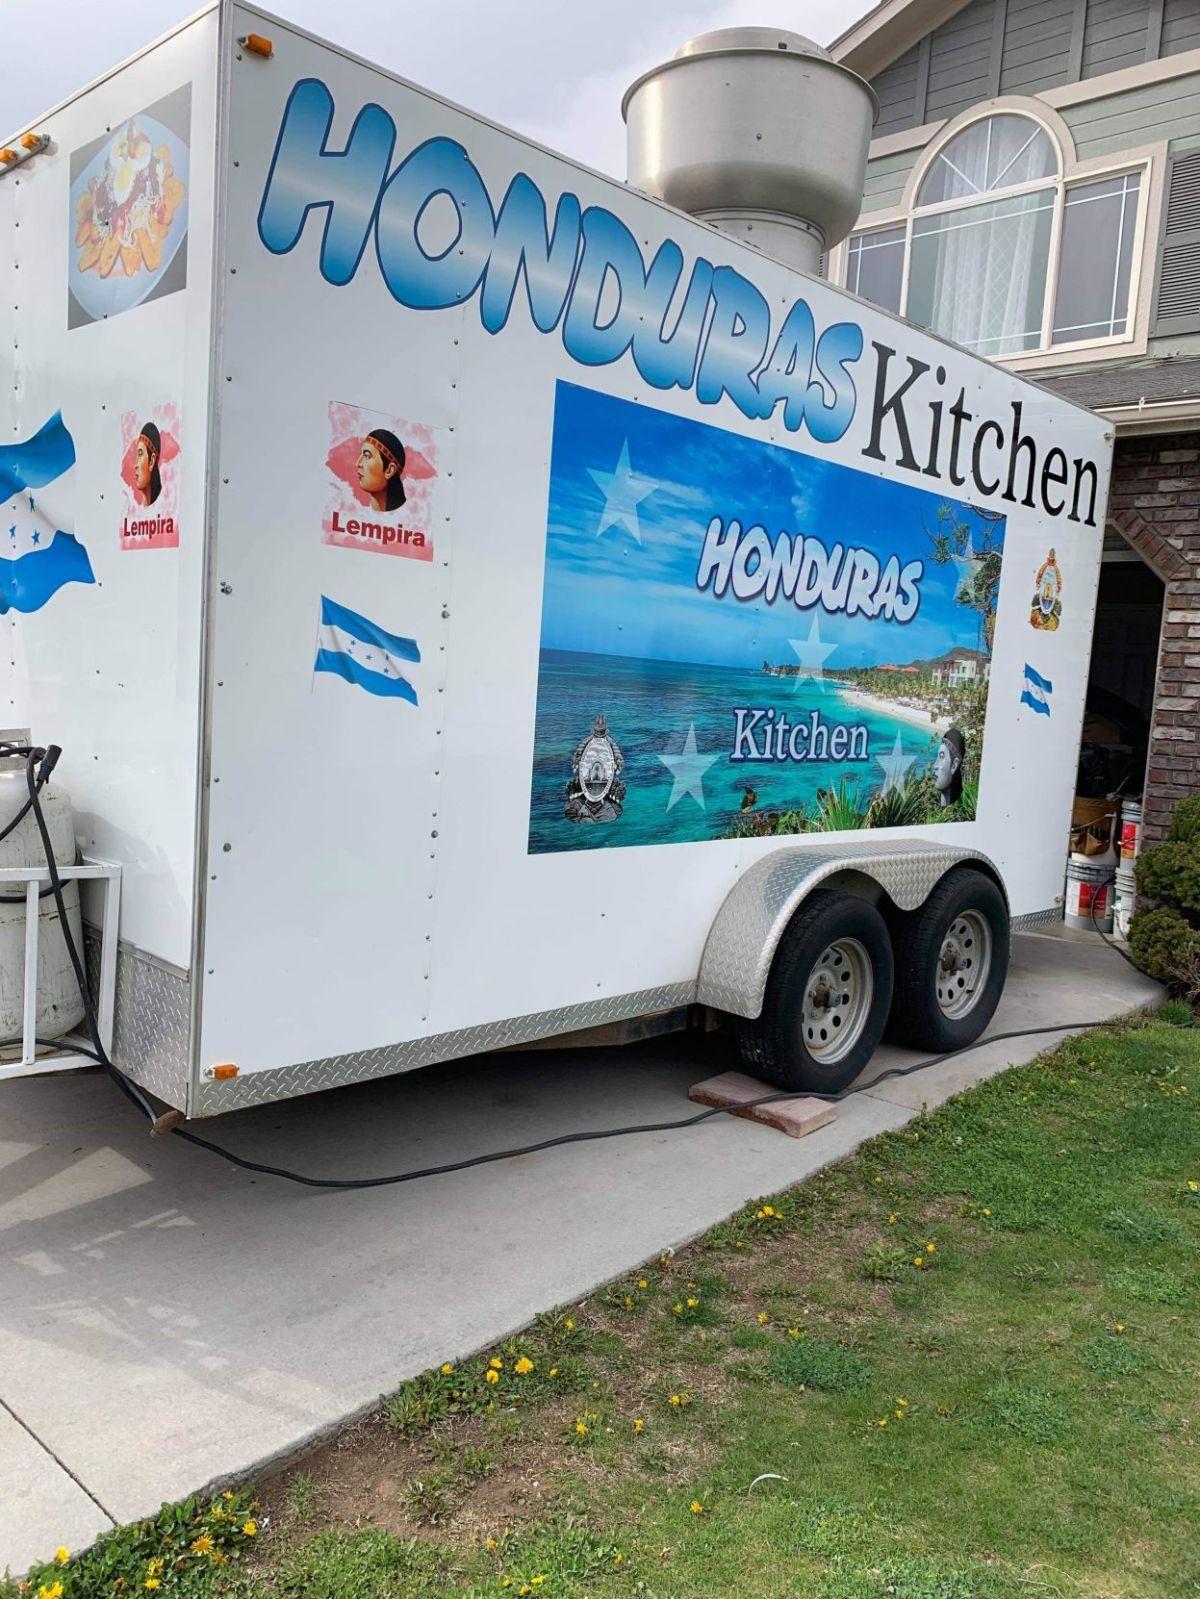 New Nampa food truck Honduras Kitchen Idaho opens